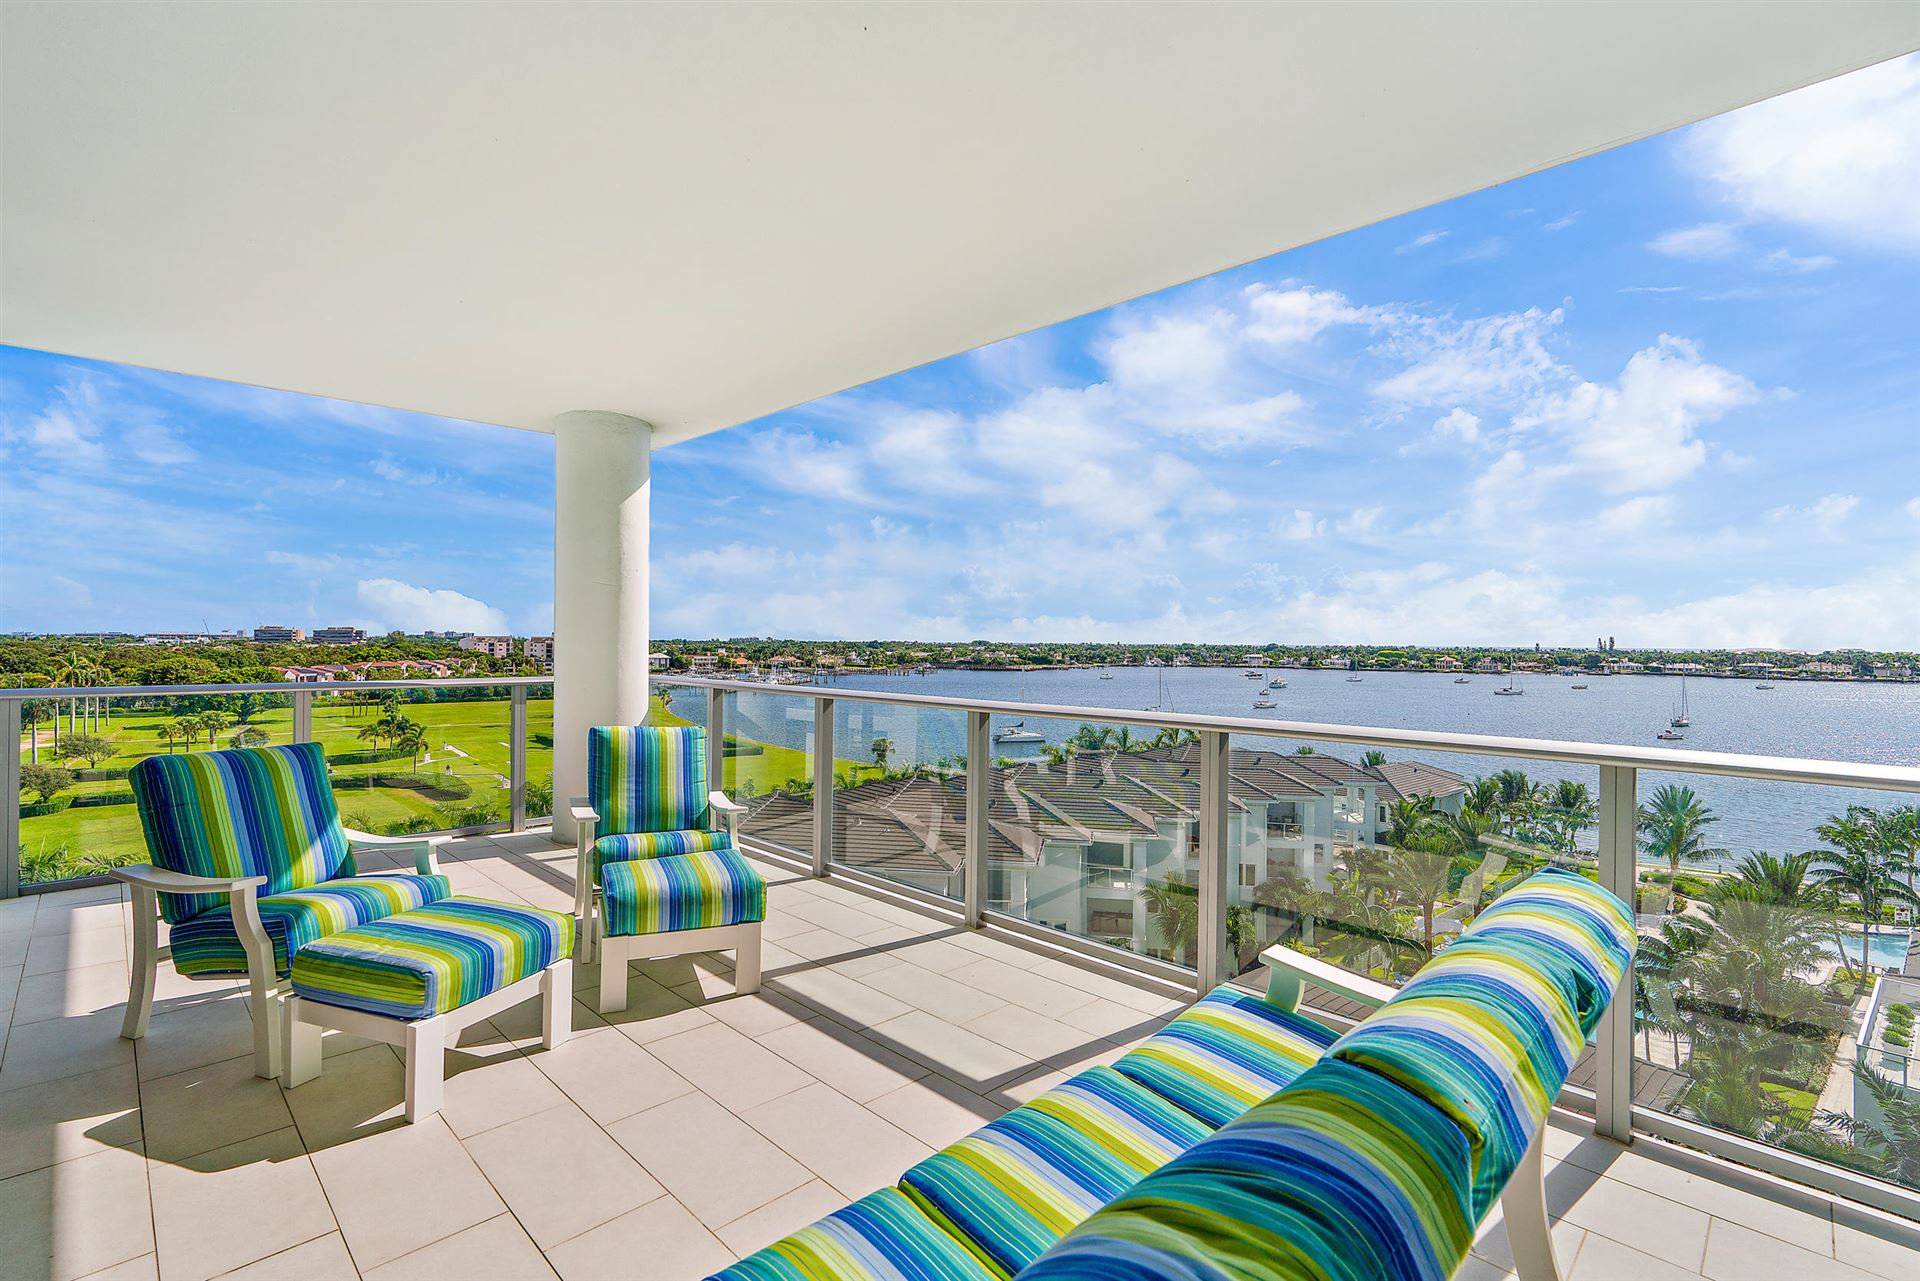 Photo of 1 Water Club Way #704, North Palm Beach, FL 33408 (MLS # RX-10680874)